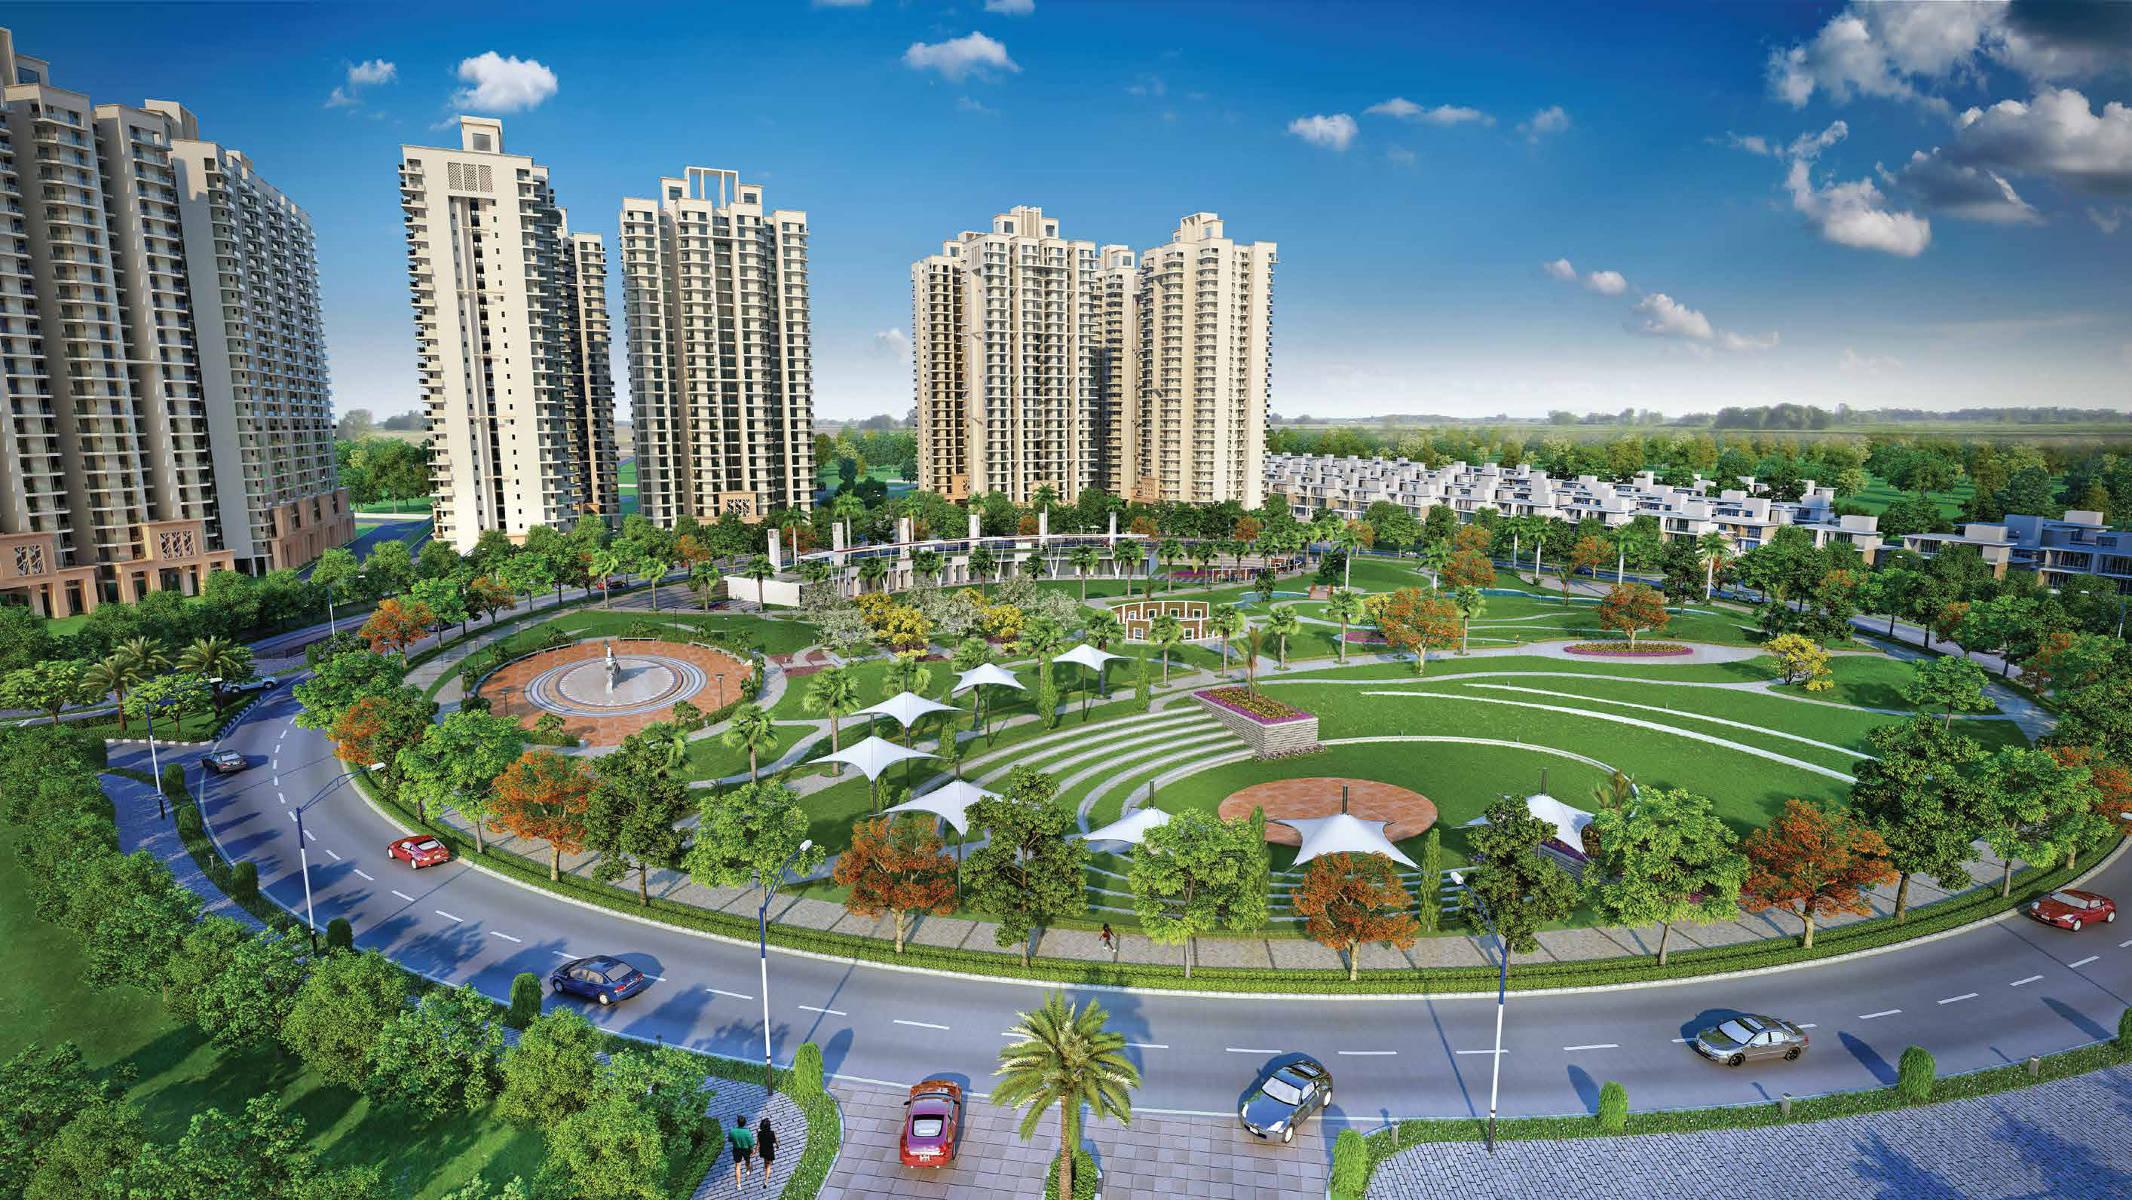 Gaursons India, Manoj Gaur, Gaur City, Investment in Gaur City, Gaur City Noida Extension, Gaur City Yamuna Expressway, Gaursons projects in Yamuna Expressway, Gaursons projects in Greater Noida West, India real estate news, Indian realty news, Real estate news India, Indian property market news, Track2Realty